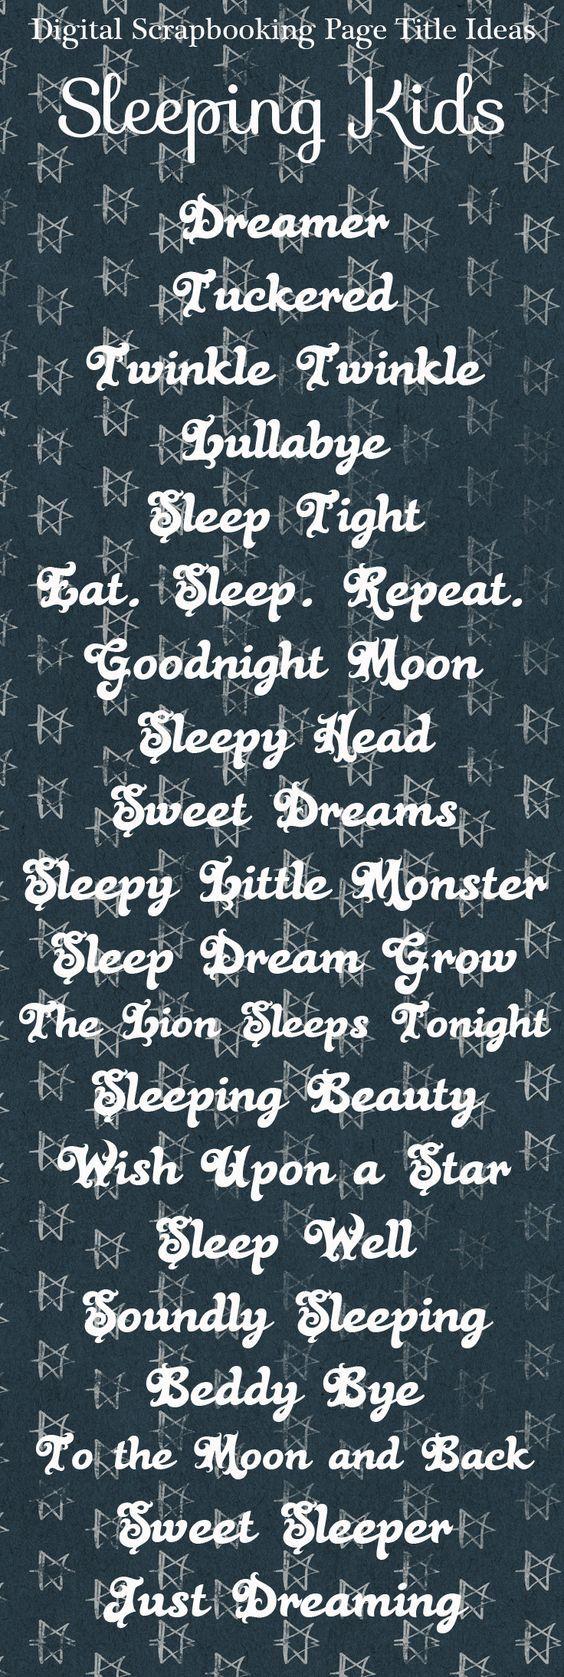 Sleeping Kids scrapbook page title ideas, scrapbook titles